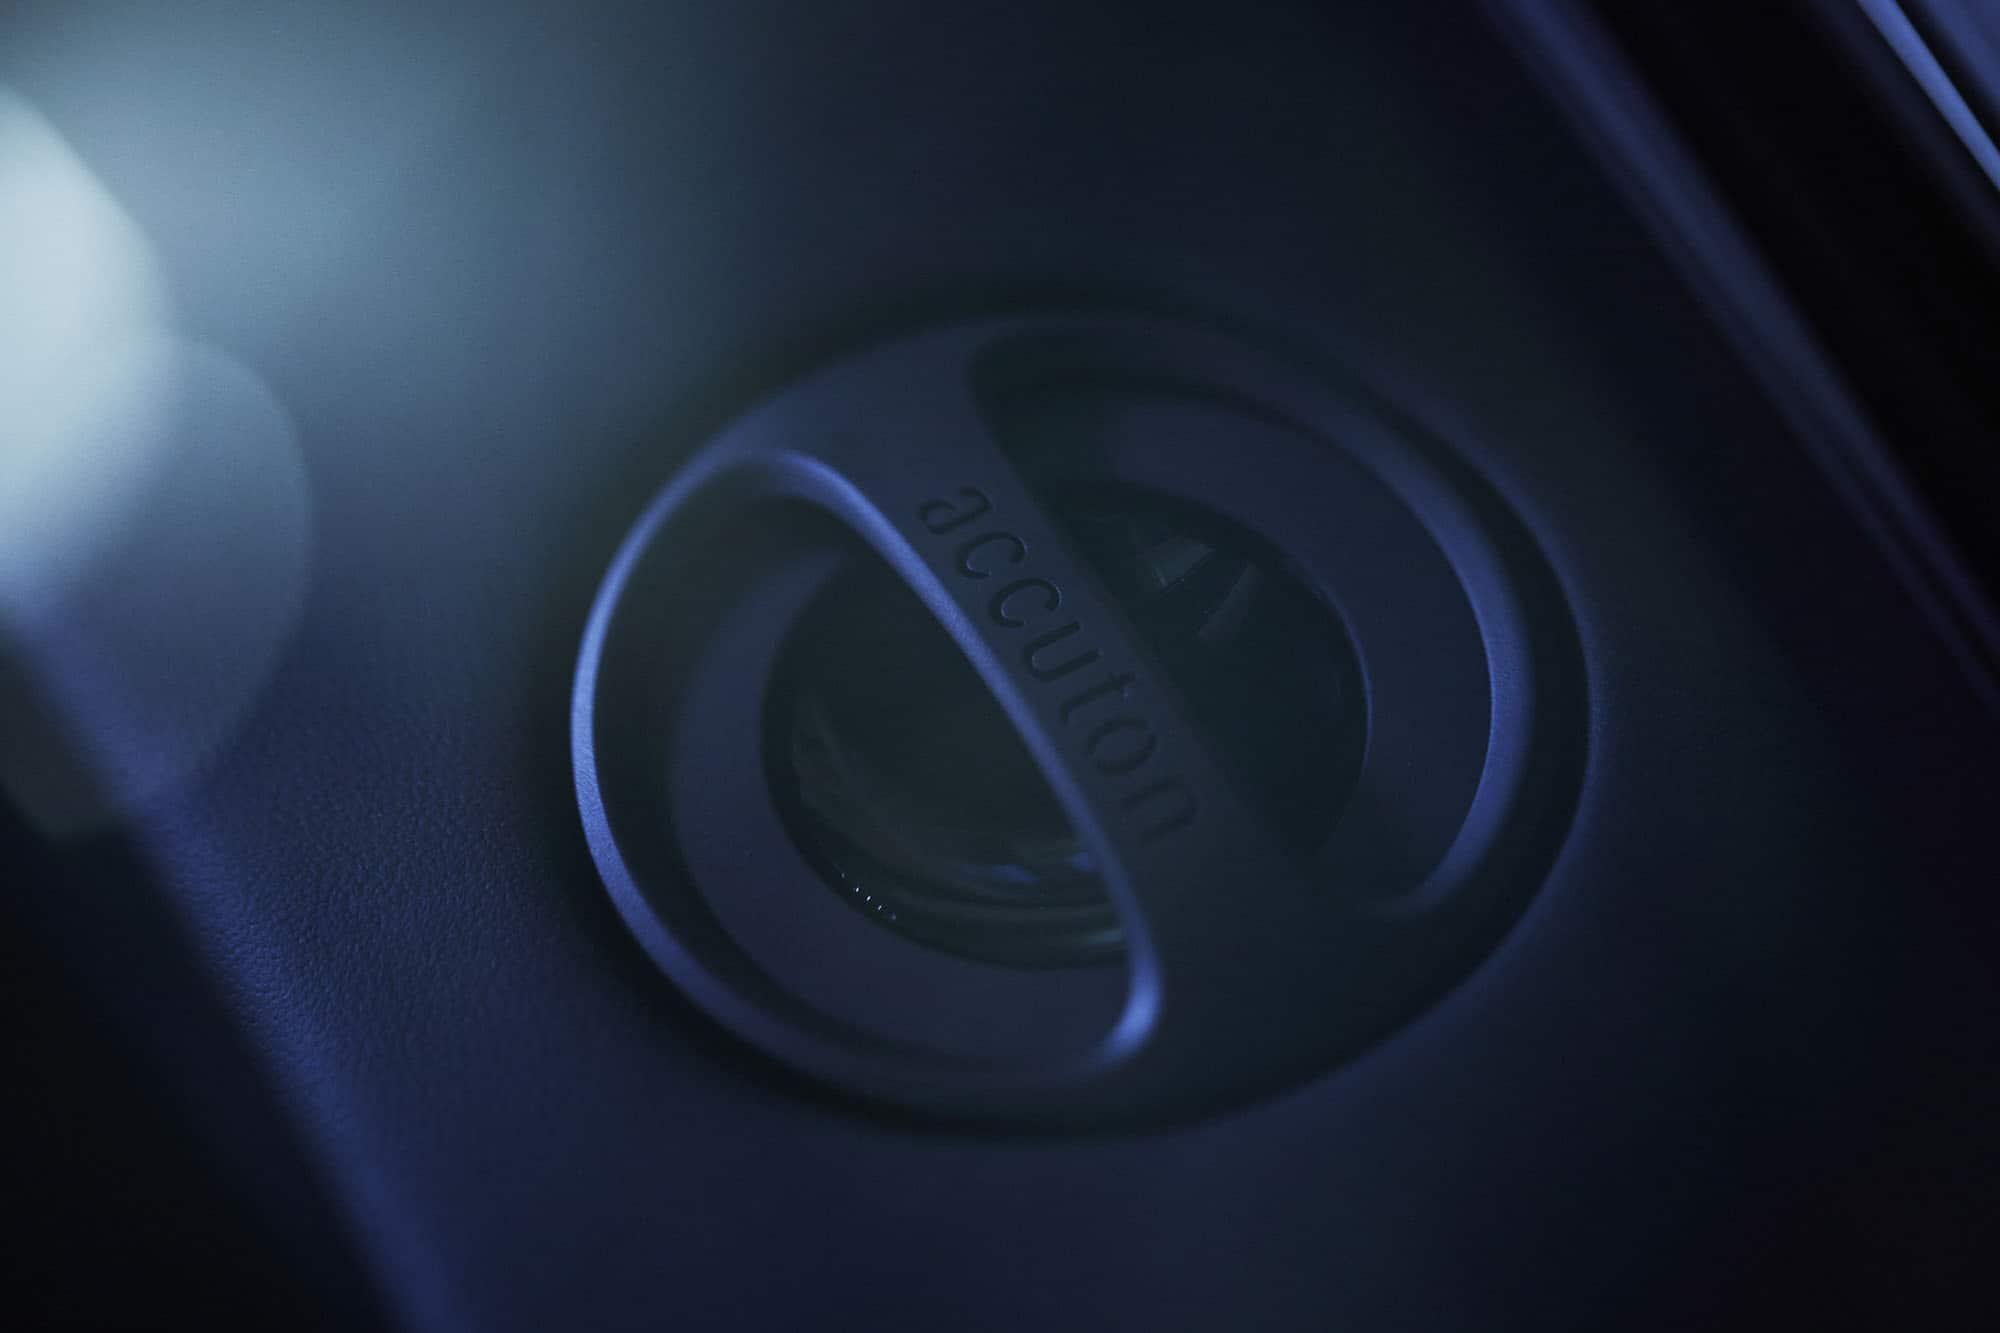 studio-ignatov-accuton-bugatti-imagekampgane-02